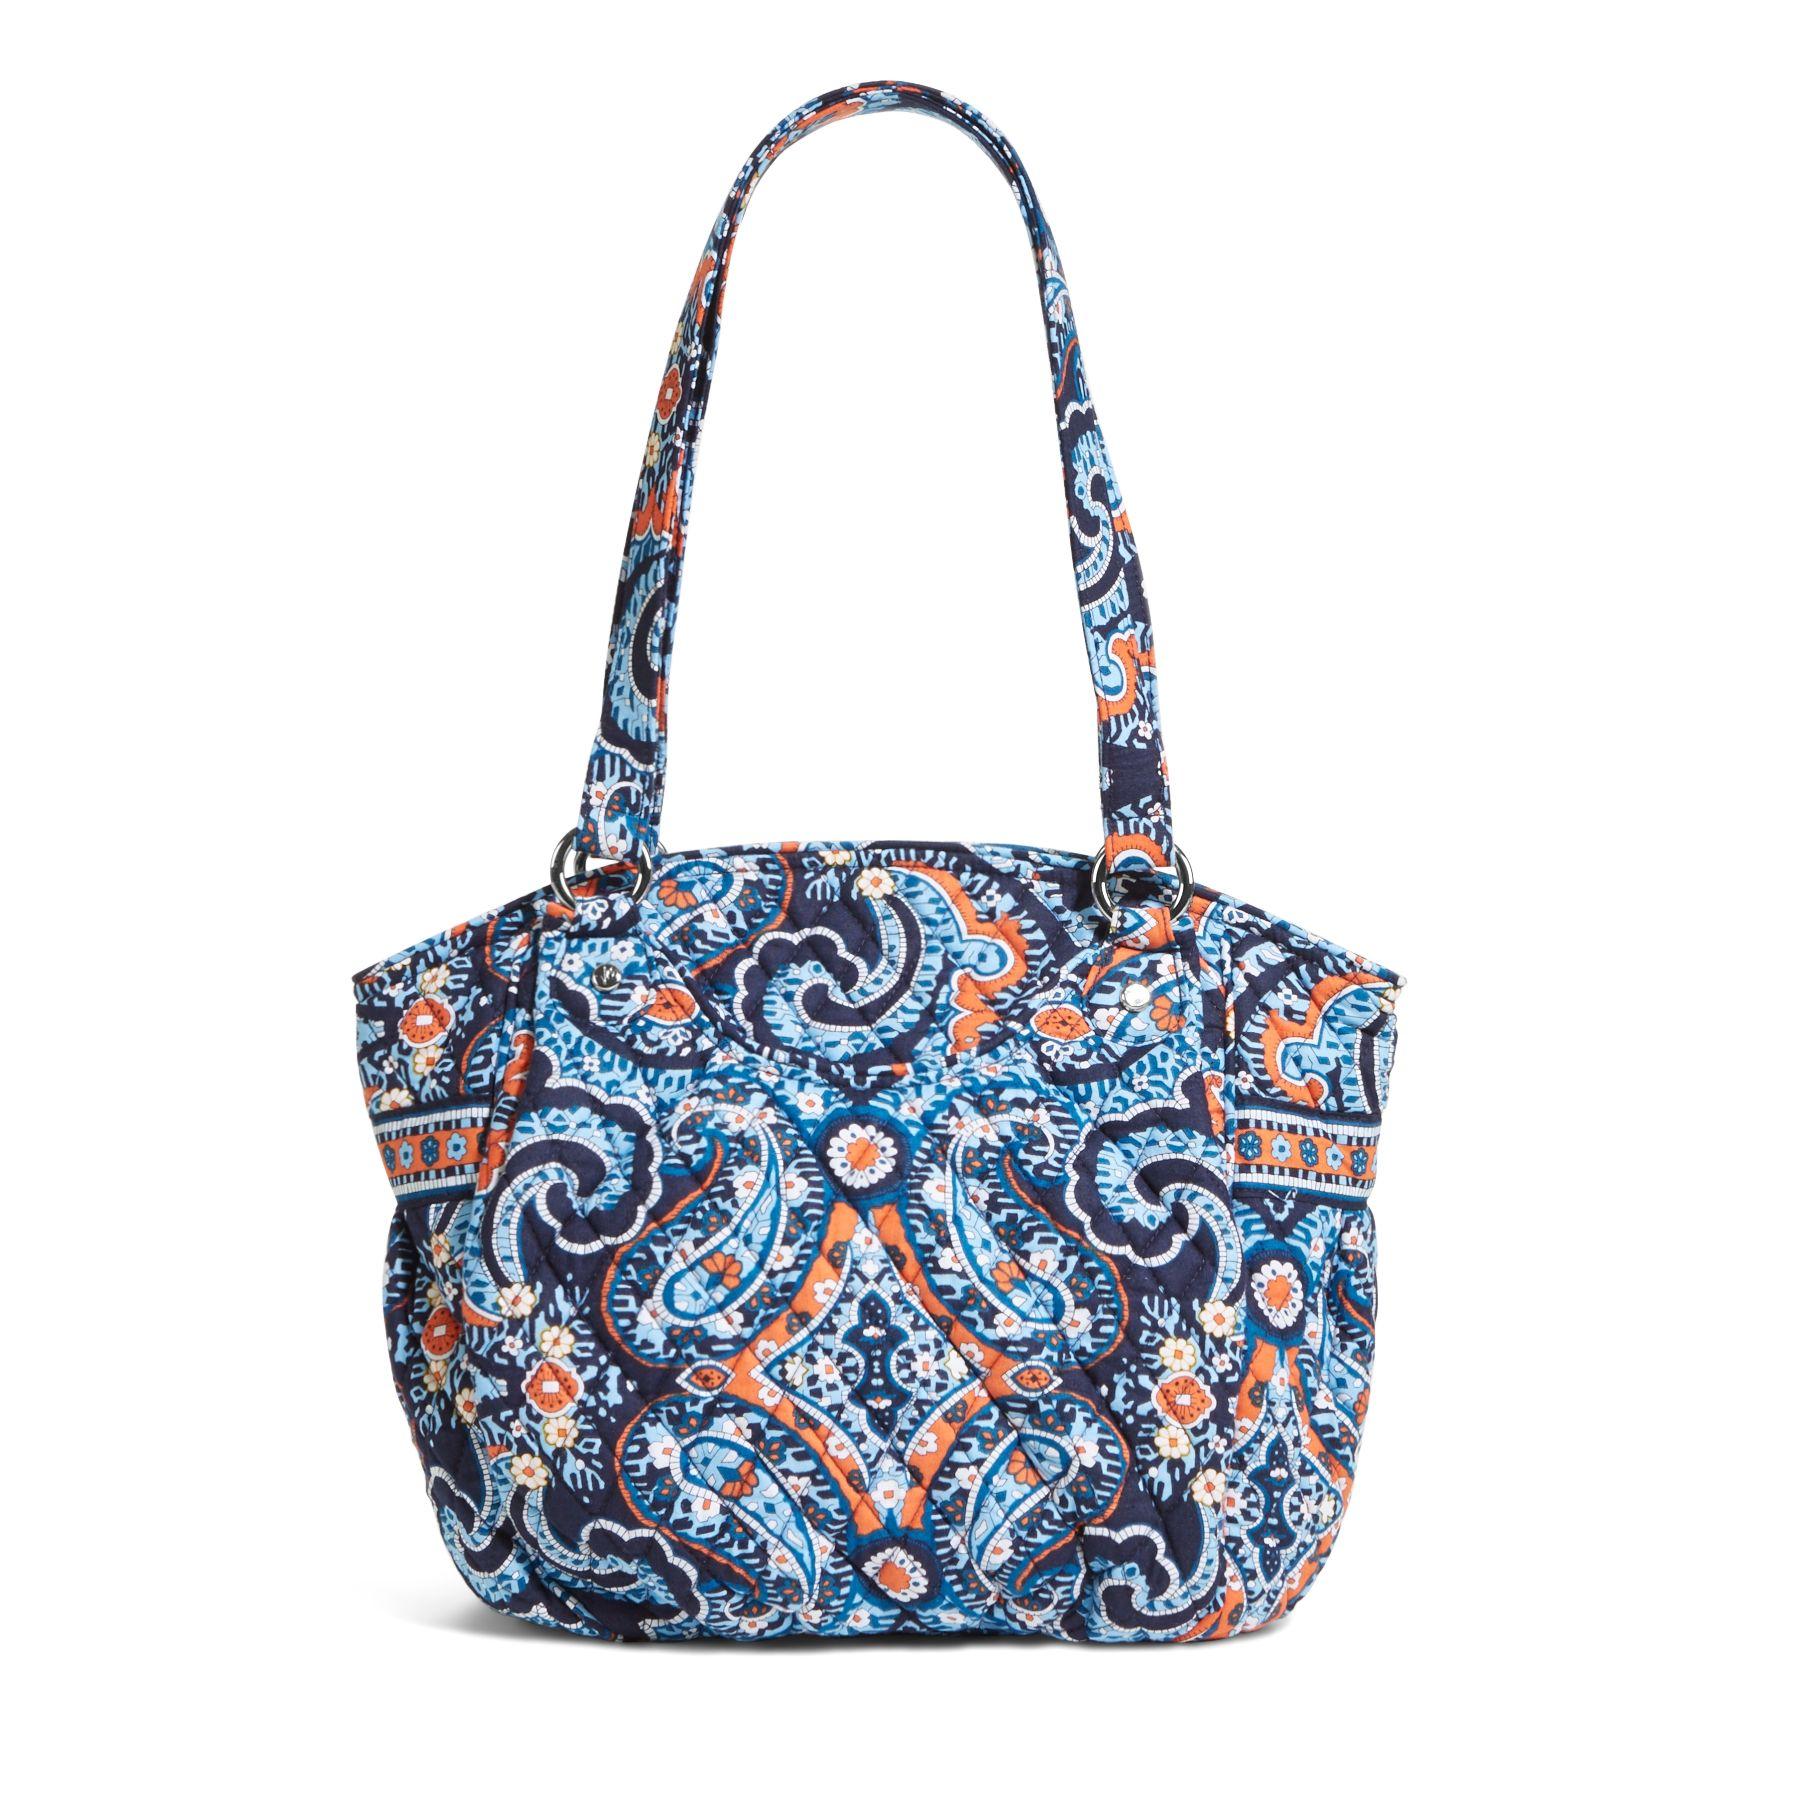 Vera Bradley Glenna Shoulder Bag in Marrakesh